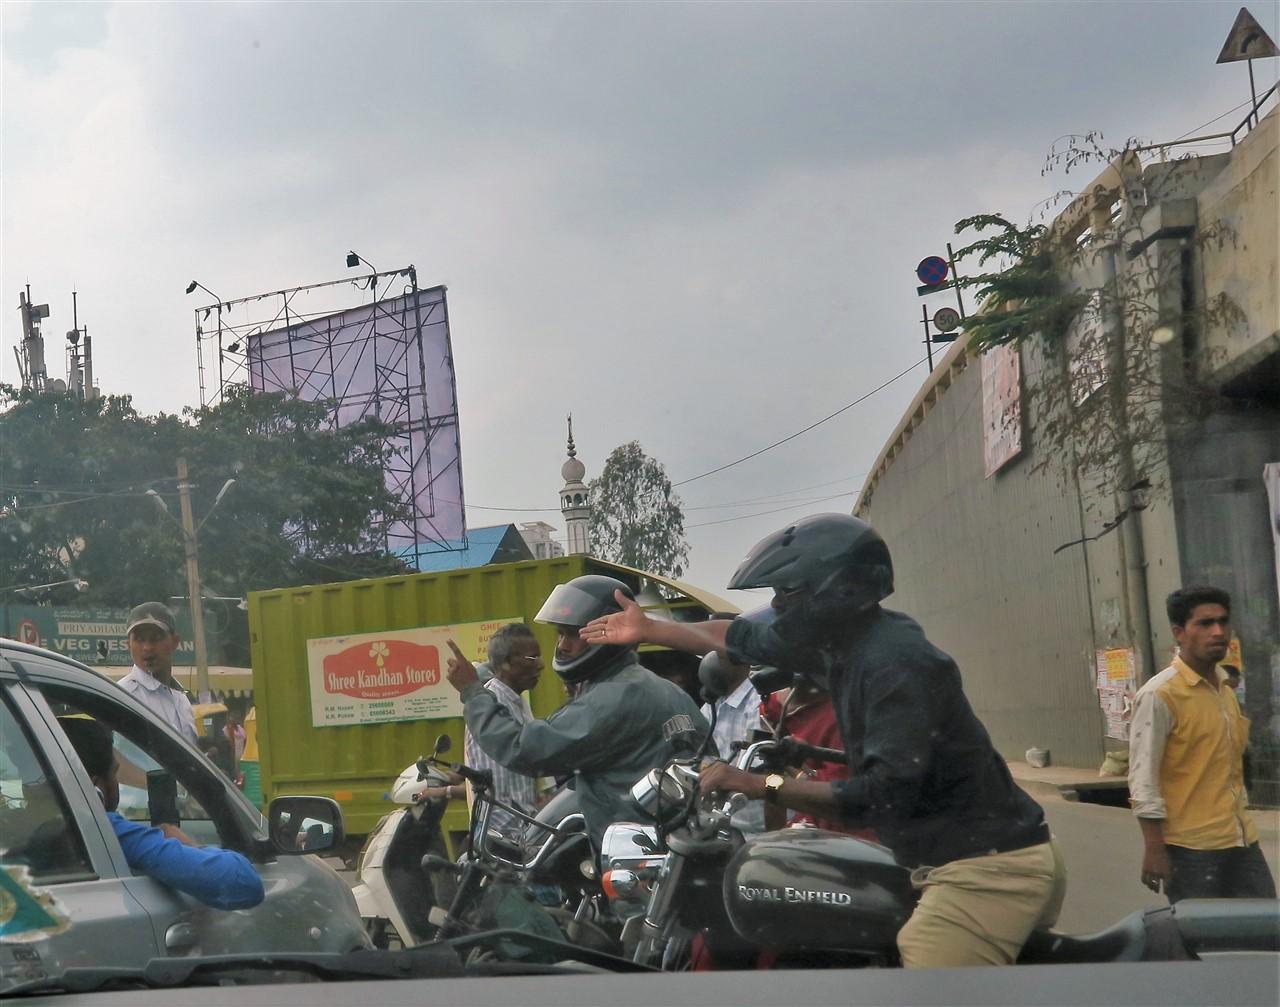 2017 11 15 9 Bangalore.jpg